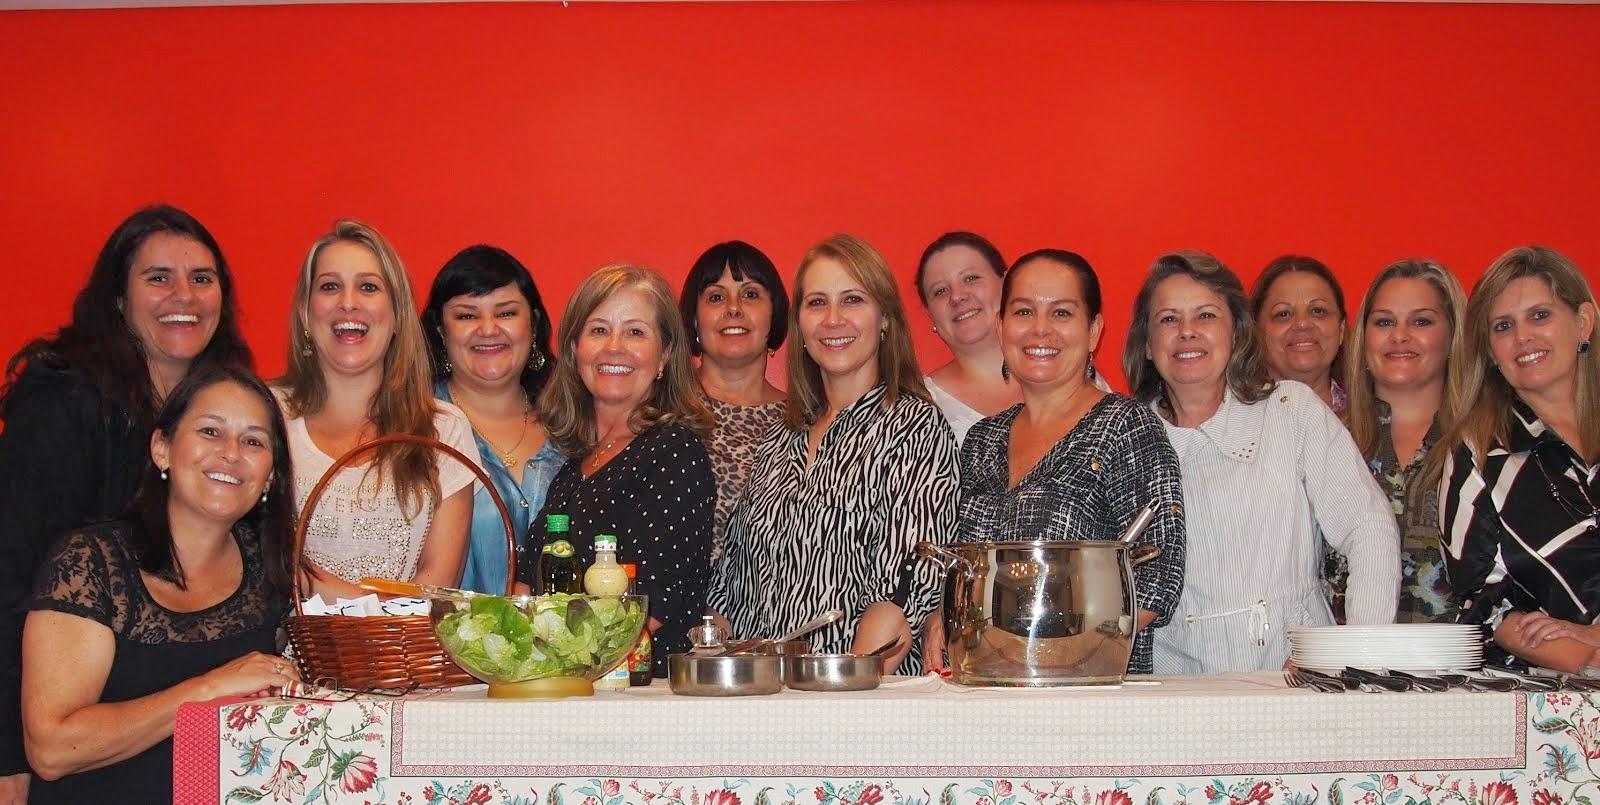 Meggie, Rosane, Andrea, Carol, Claudia, Mariza, Gisele, Bete, Angela, Josélia, Paty, Carina e Ro!